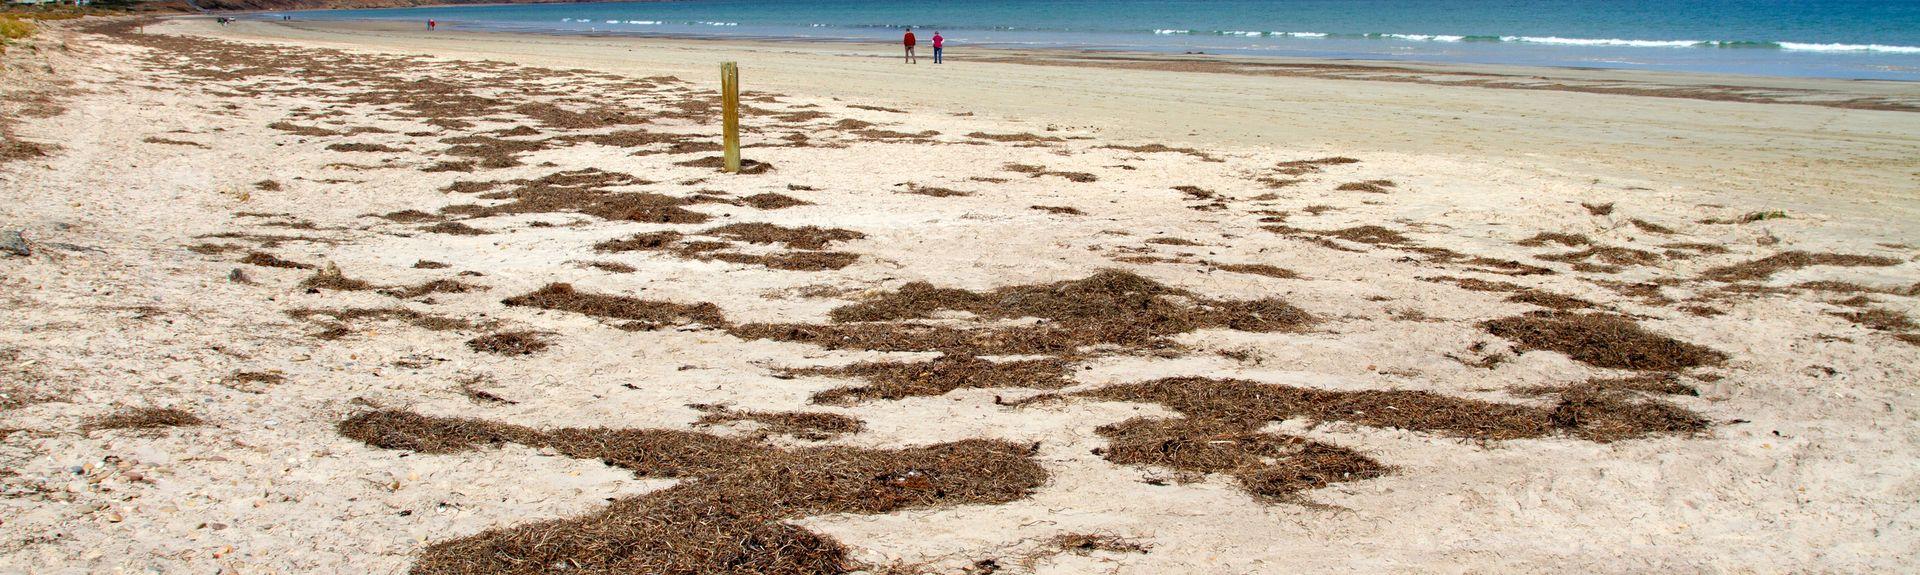 Aldinga Beach, Adelaide, South Australia, Australië